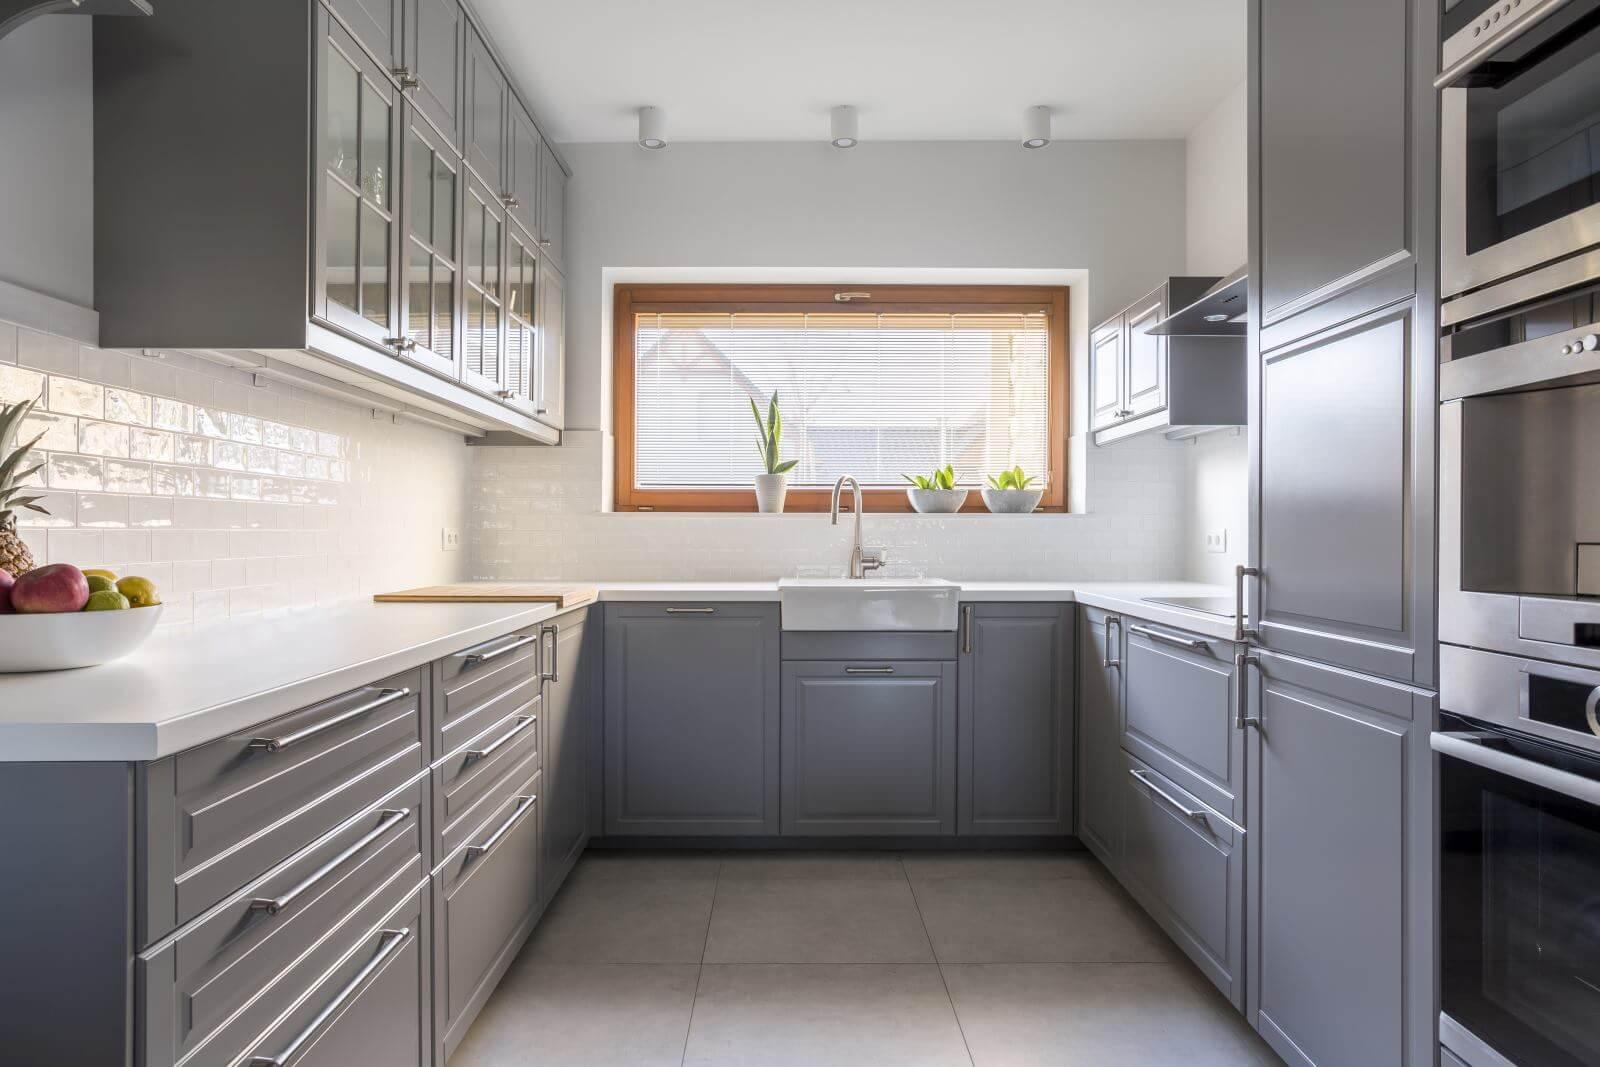 Light, spacious kitchen with window and white brick tiles